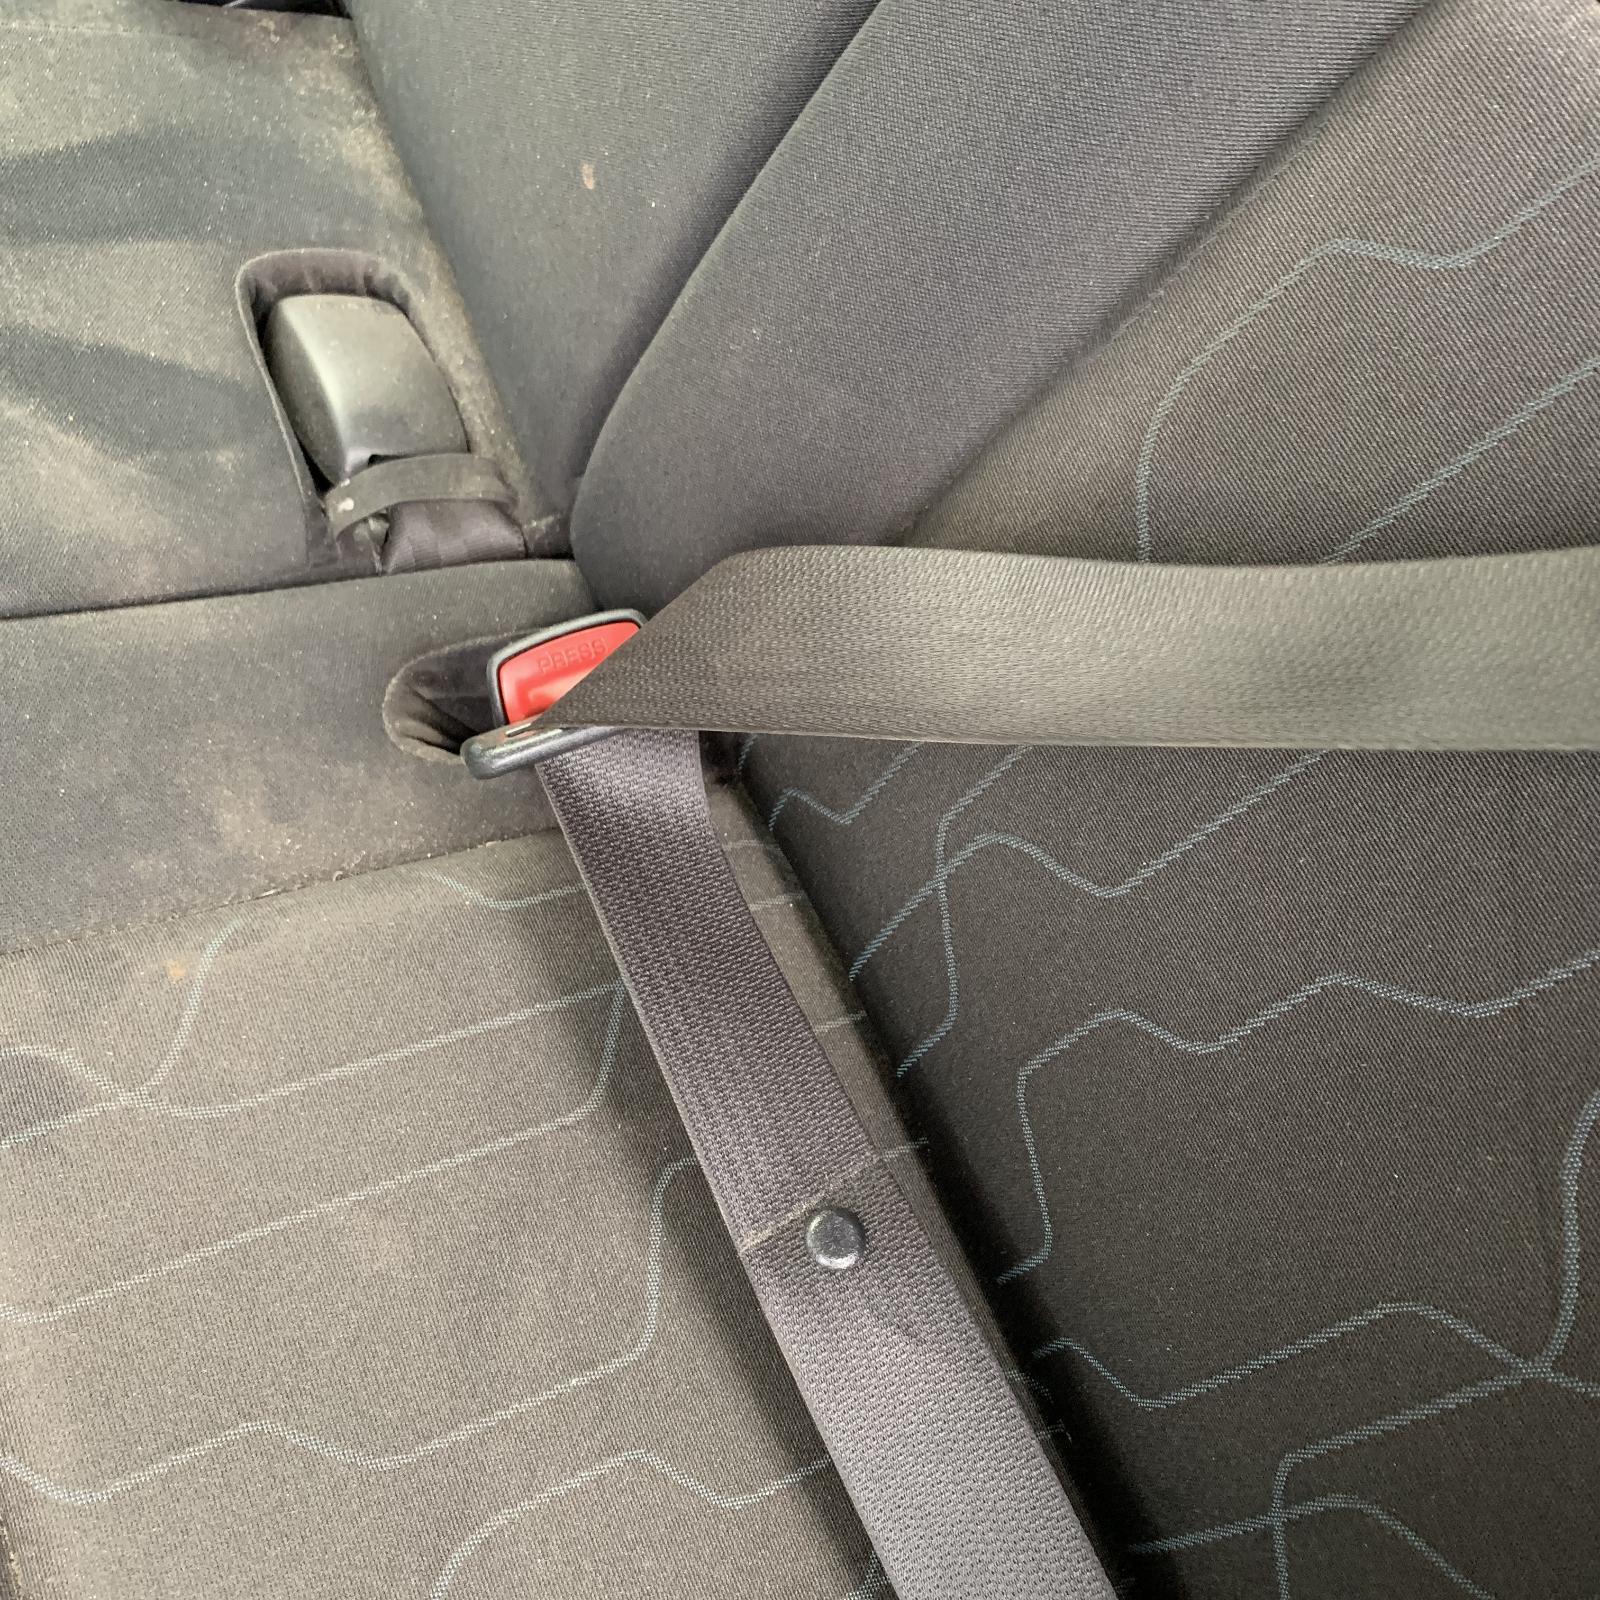 TOYOTA COROLLA, Seatbelt/Stalk, LH REAR, SEAT BELT ONLY, ZRE152R, HATCH, 03/07-09/12